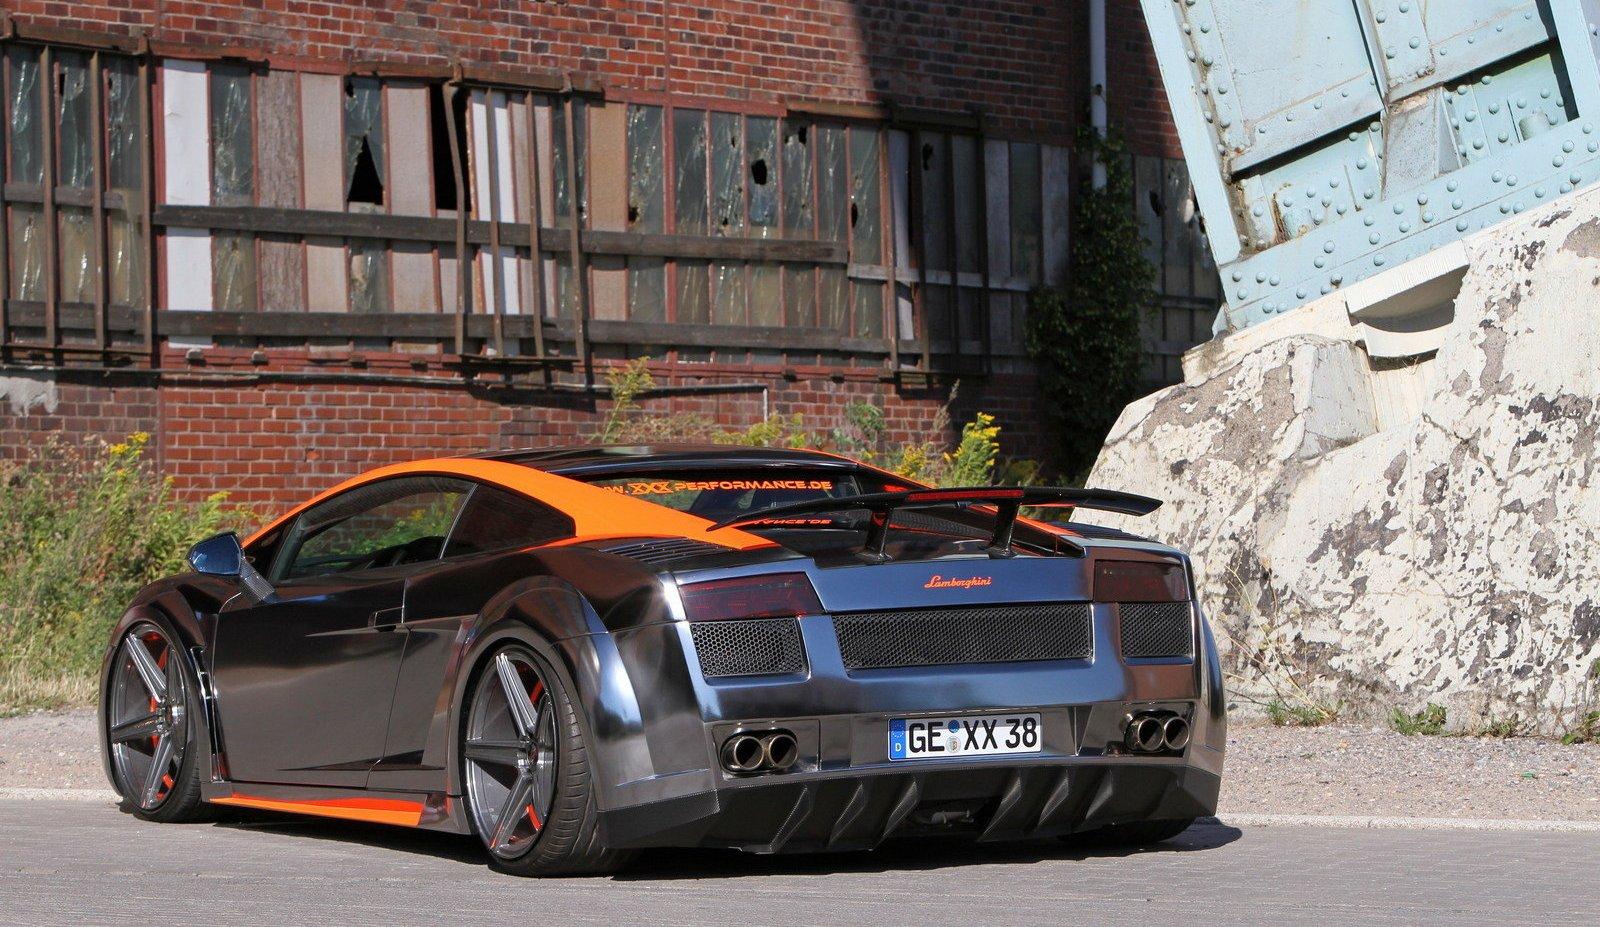 2005-lamborghini-gallardo-4 - no car no fun! muscle cars and power